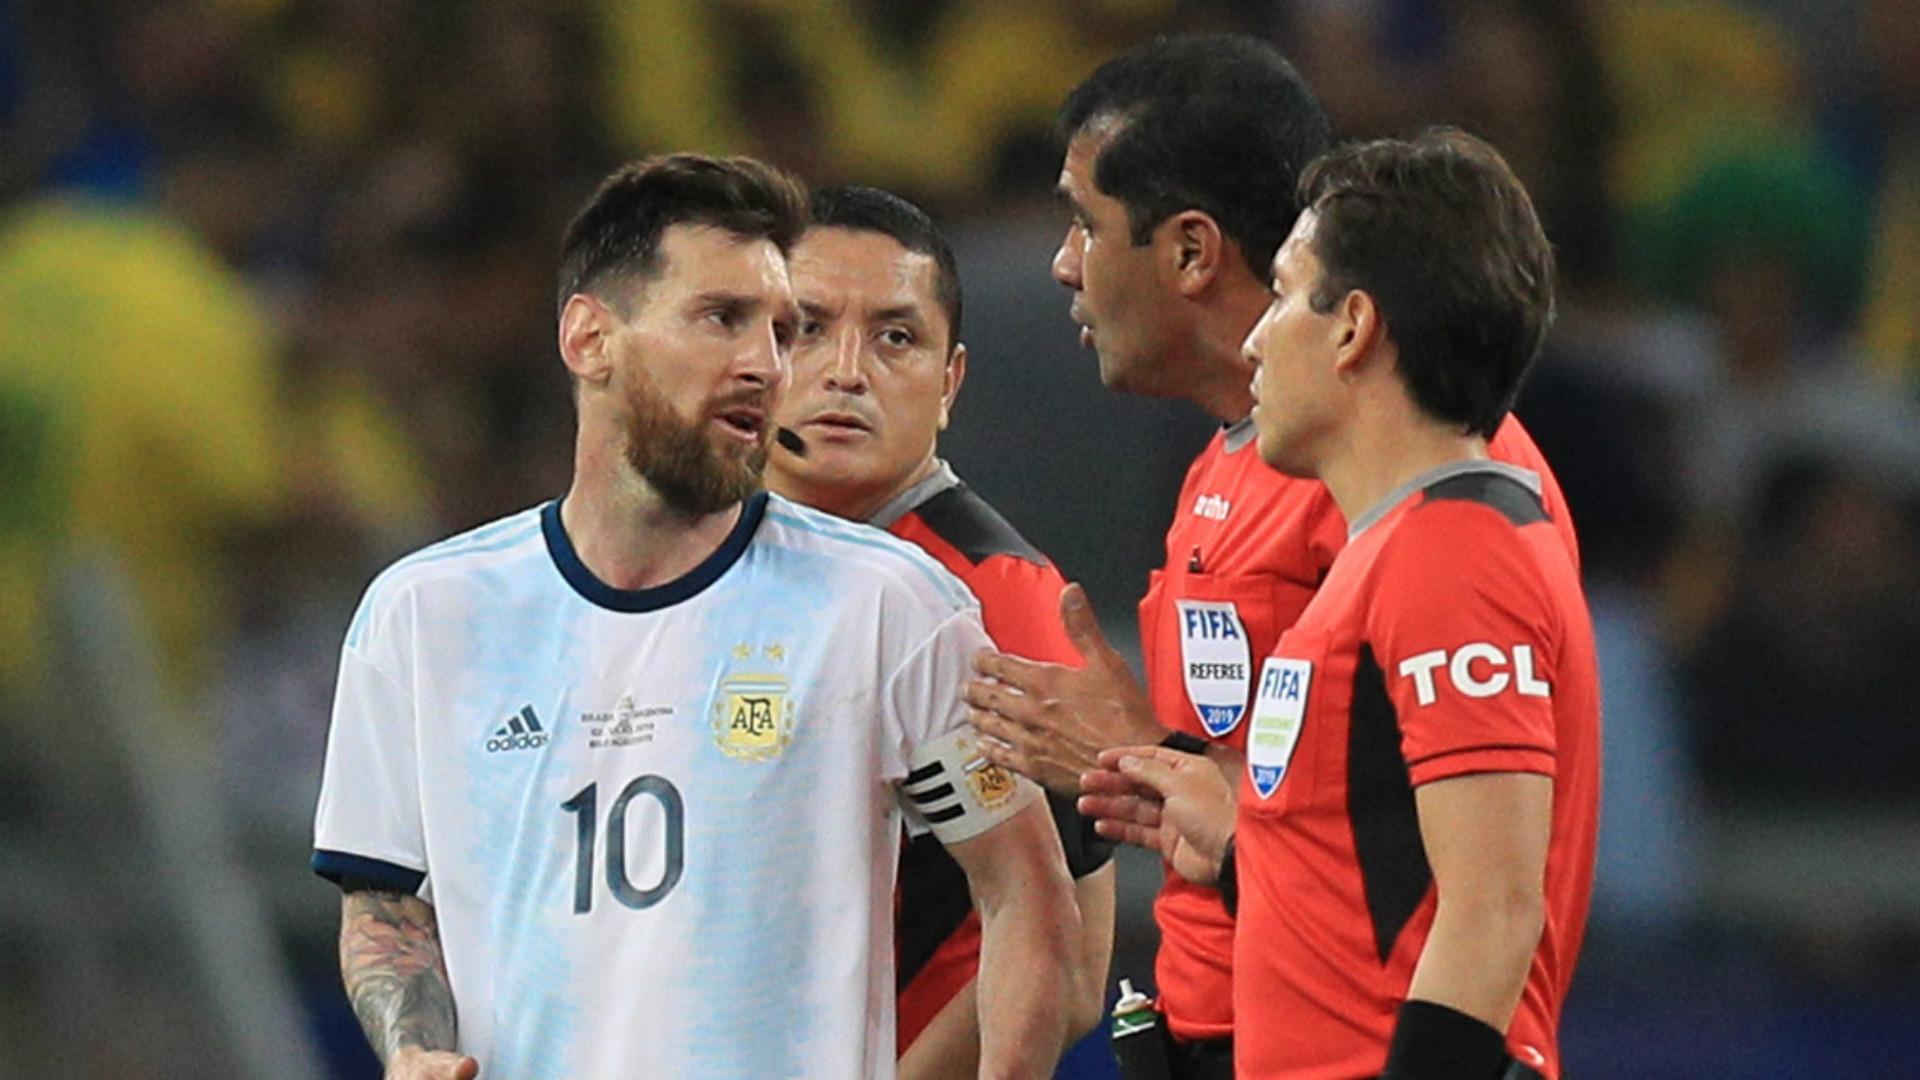 Brazil vs Argentina referee Zambrano explains controversial decisions following Messi backlash